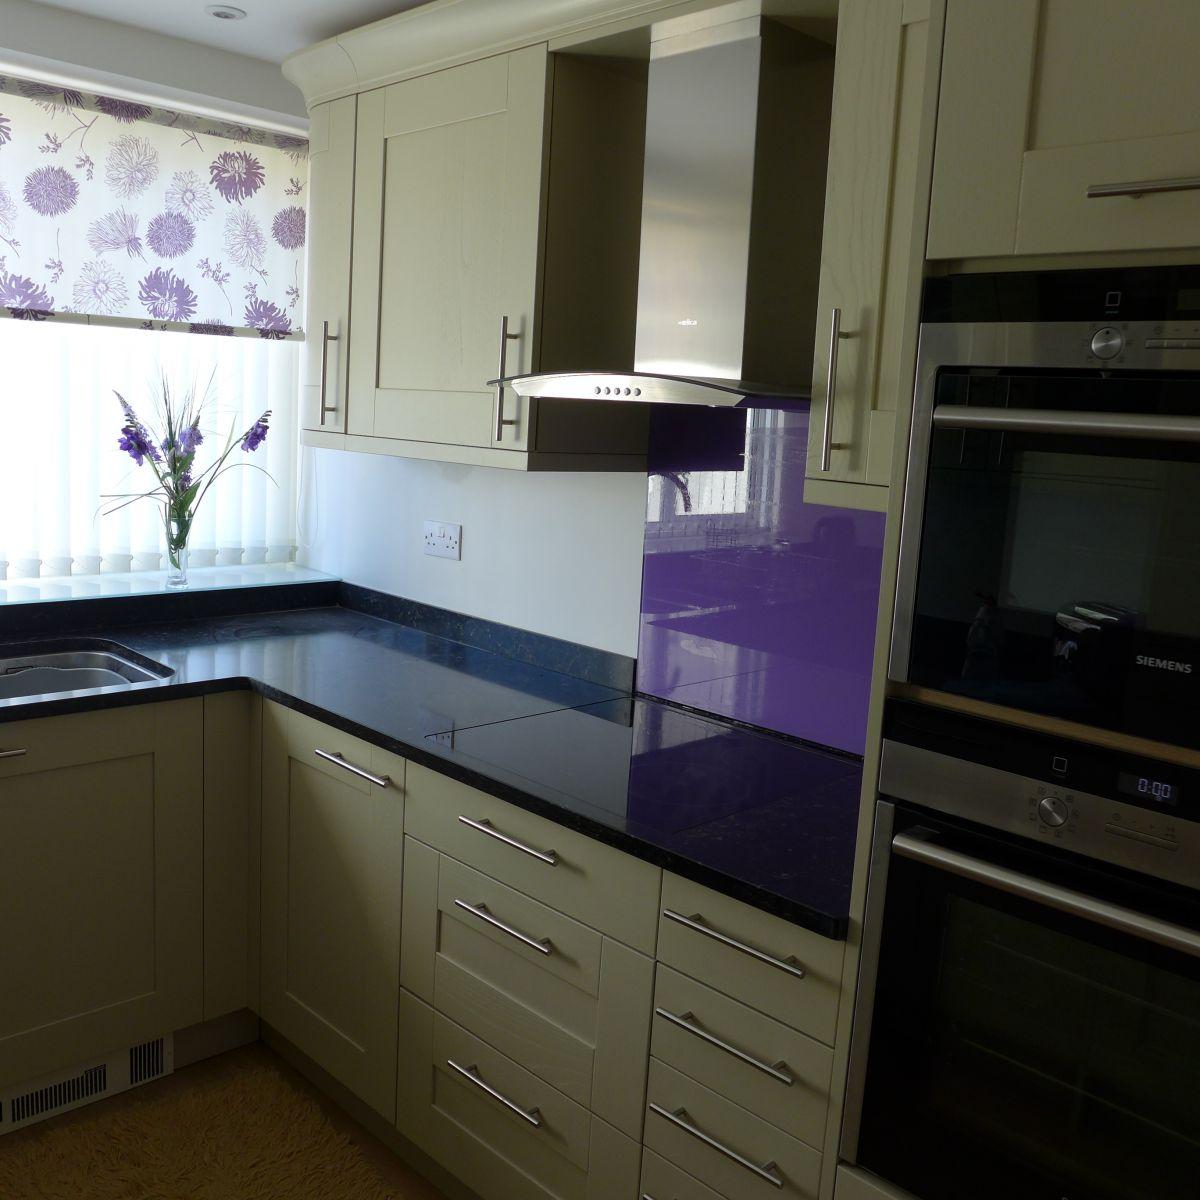 Flat refurbishment burnham on sea style within for Small kitchen ideas uk